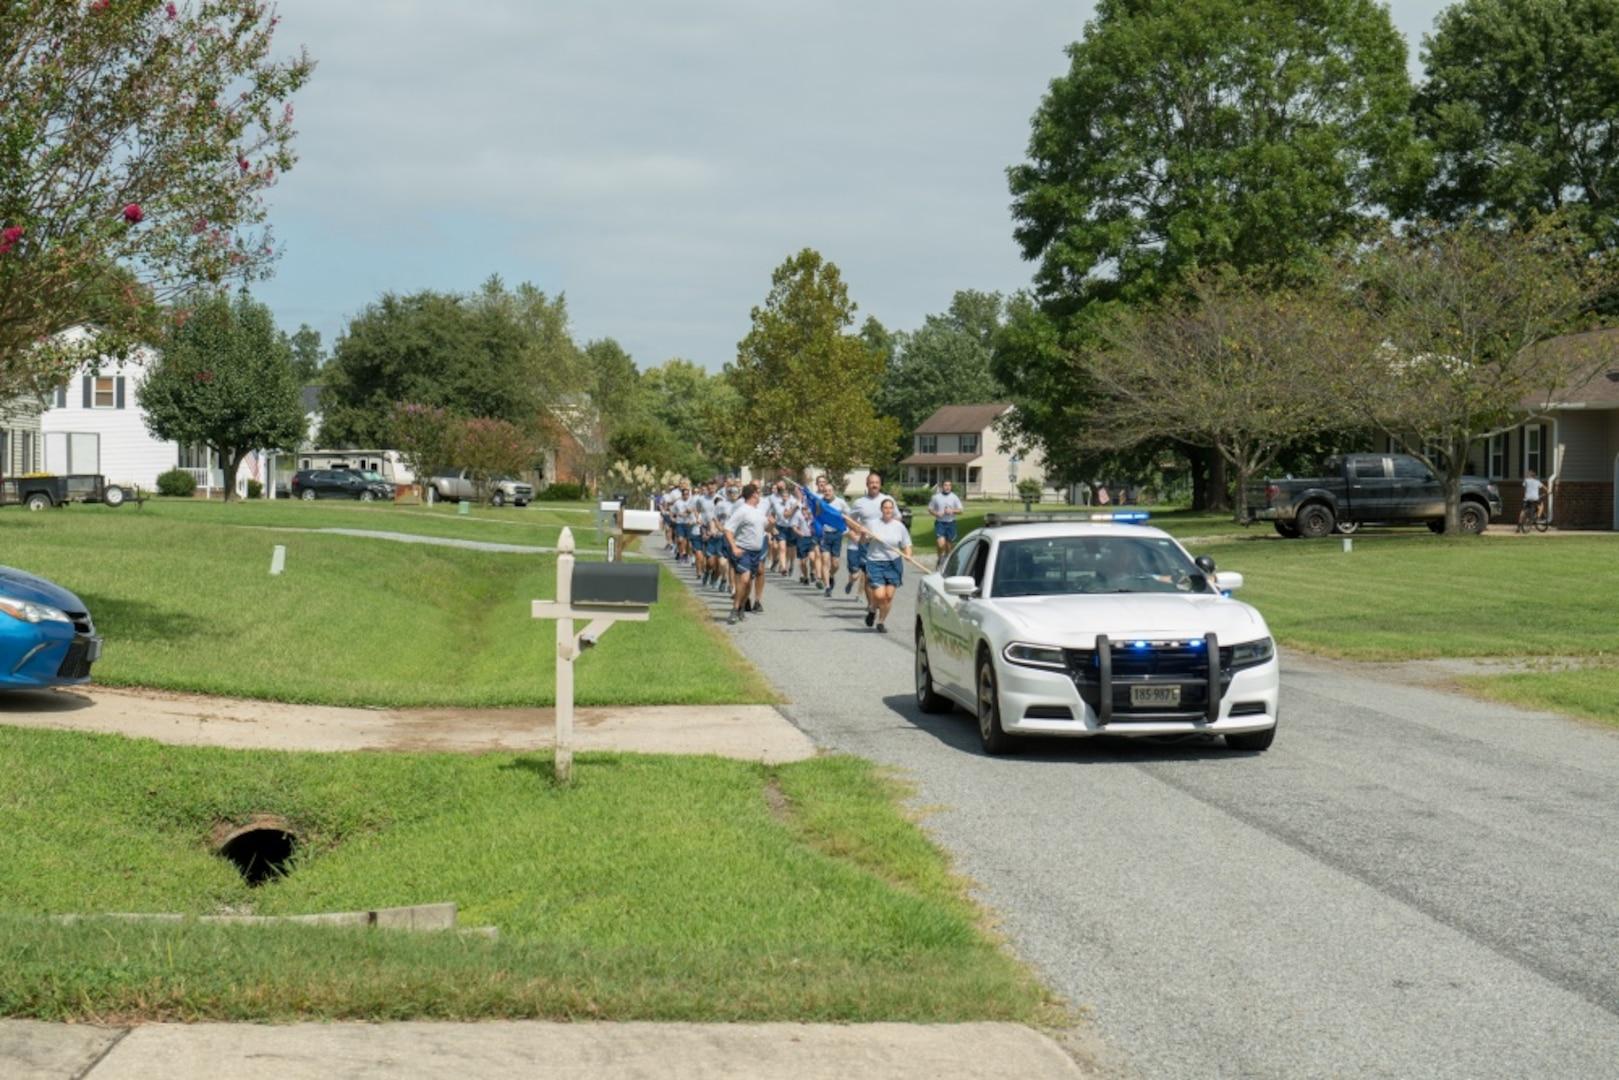 A law enforcement patrol vehicle escorts Airmen as they run through a neighborhood